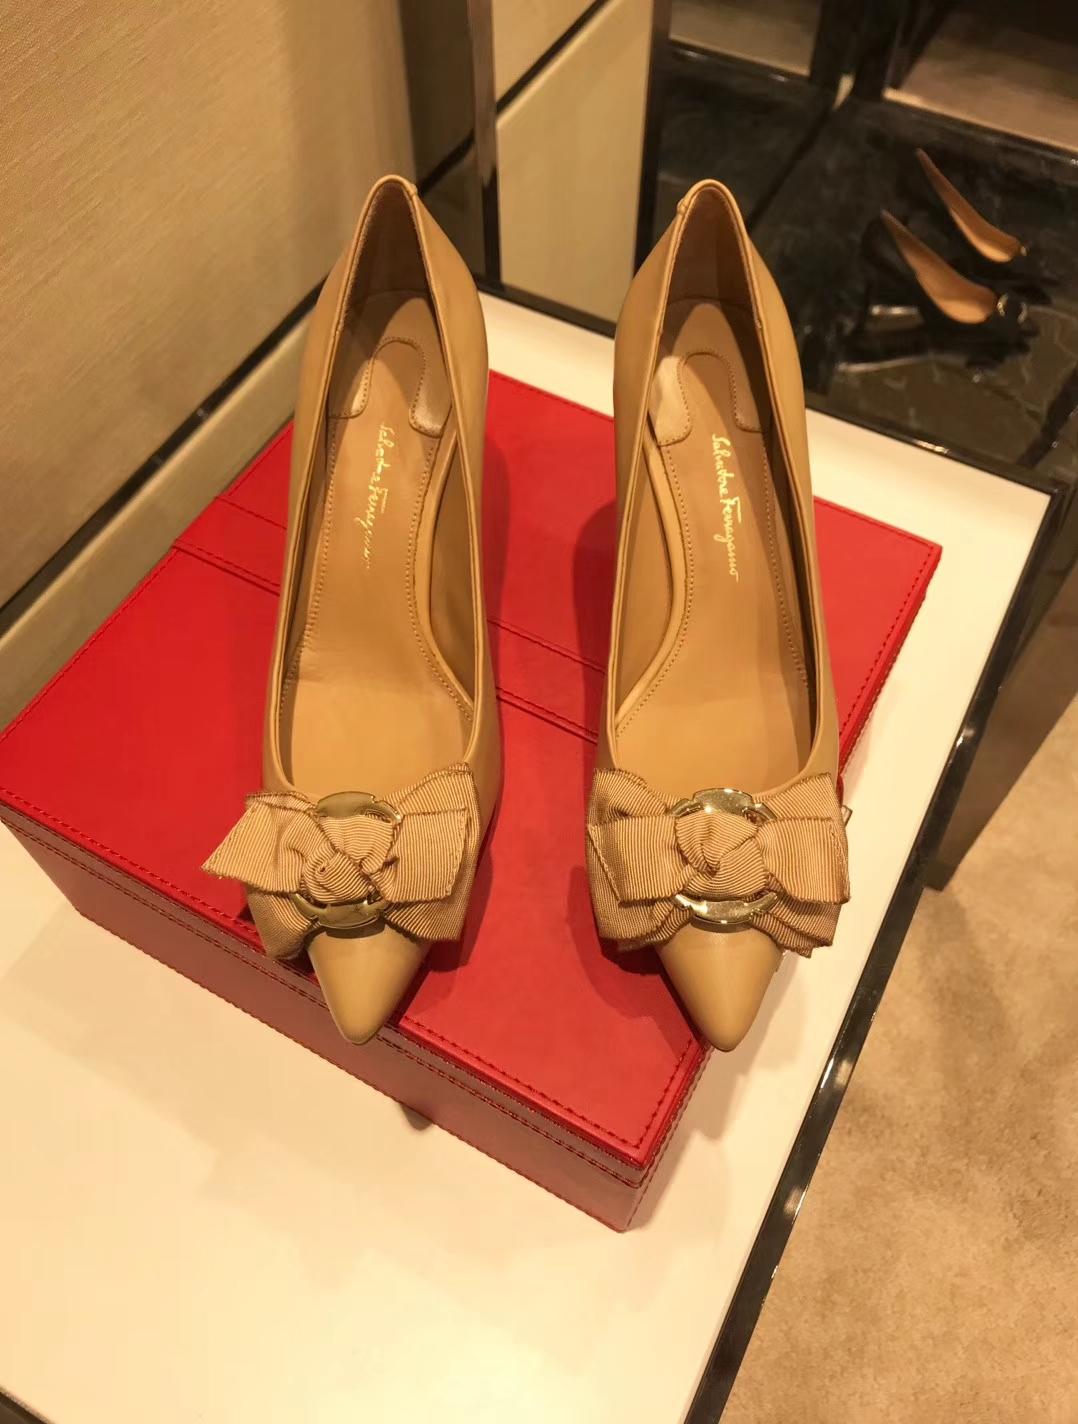 Salvatore Ferragamo菲拉格慕蝴蝶结高跟鞋2018专柜同步发售